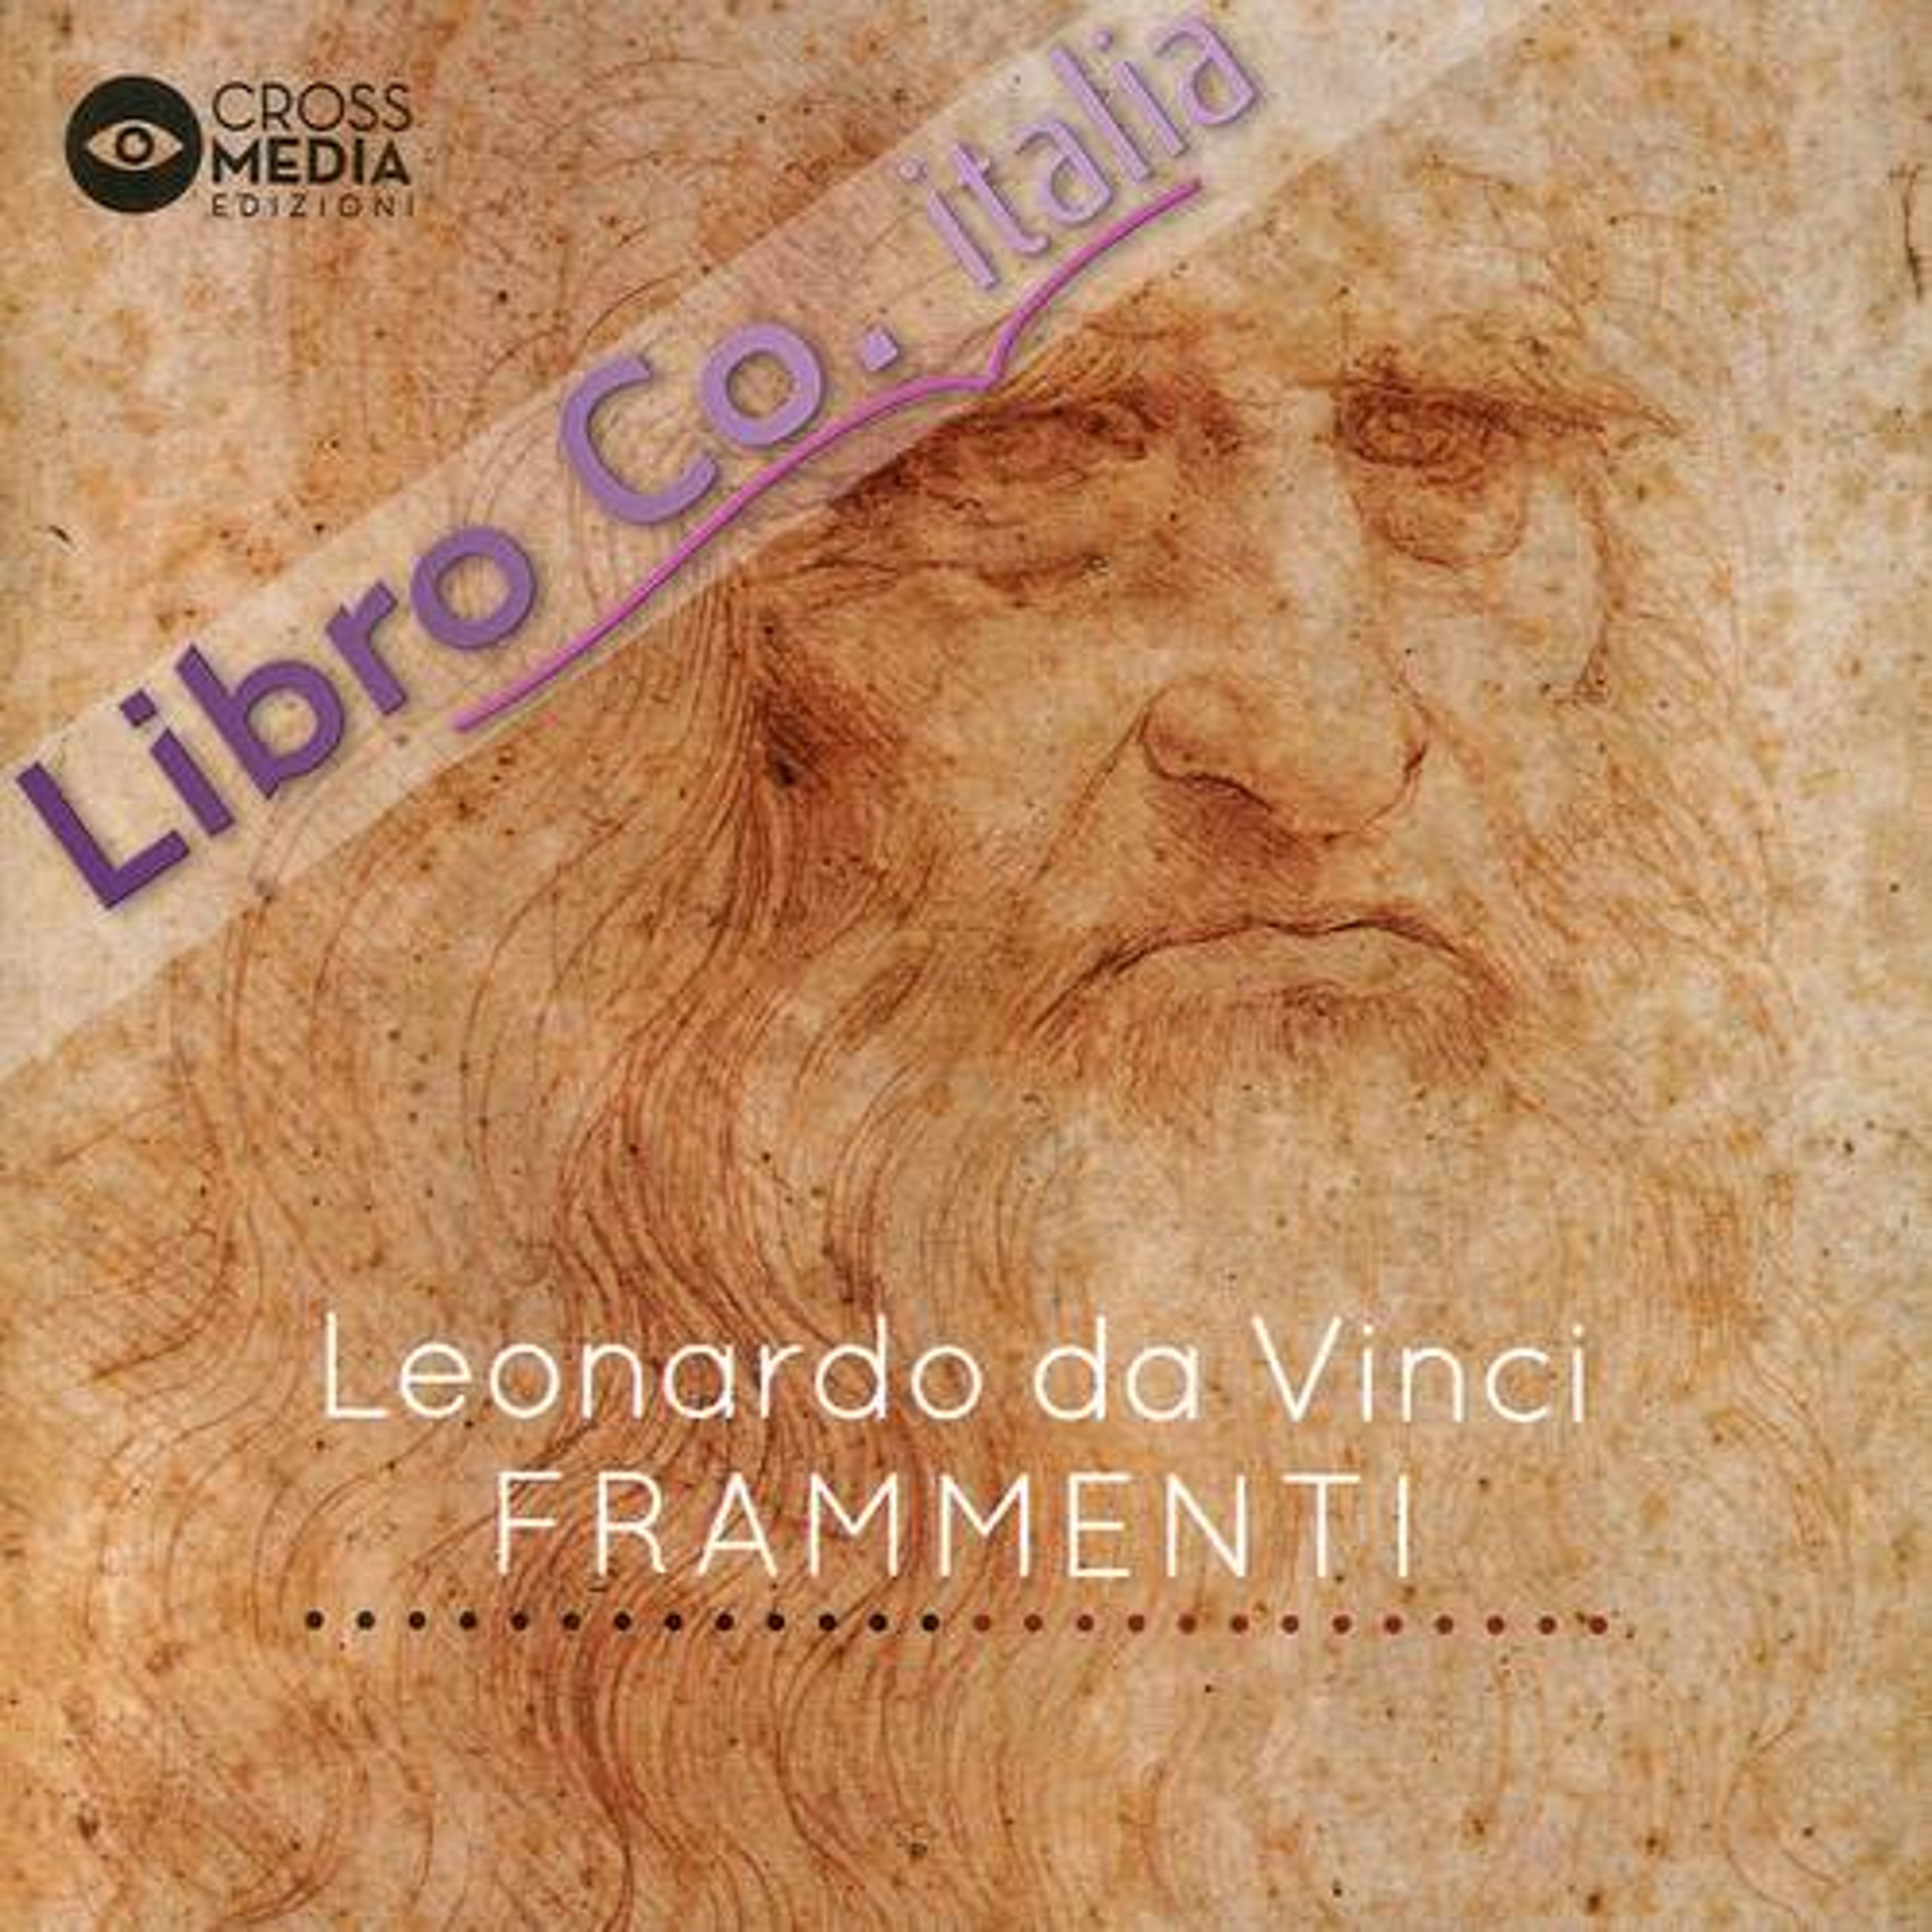 Leonardo da vinci. Frammenti